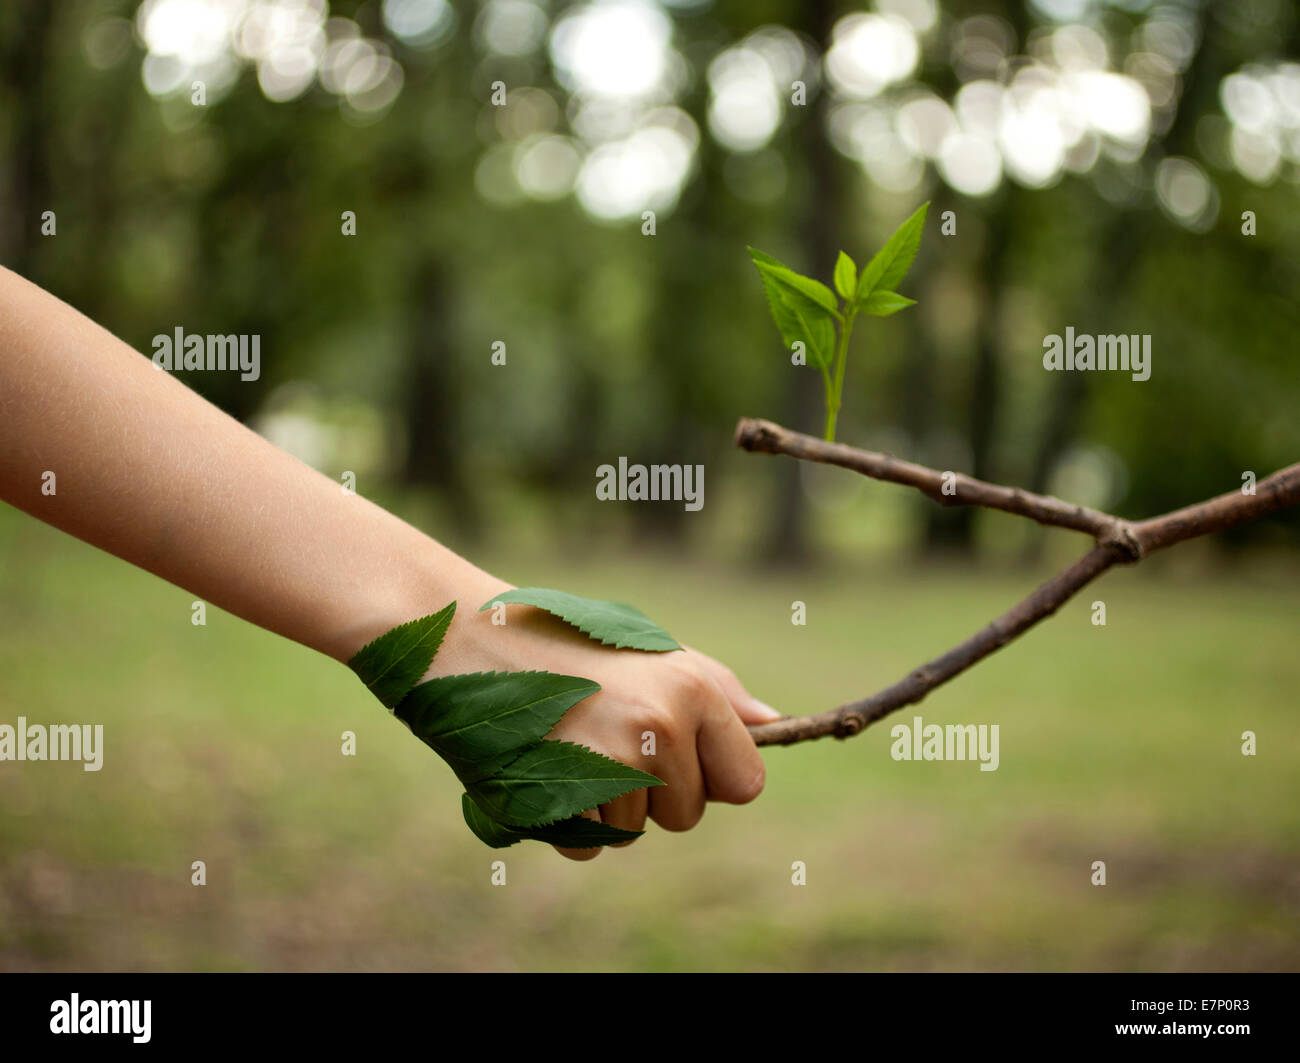 Environment concept. Handshake between human hand and tree. - Stock Image